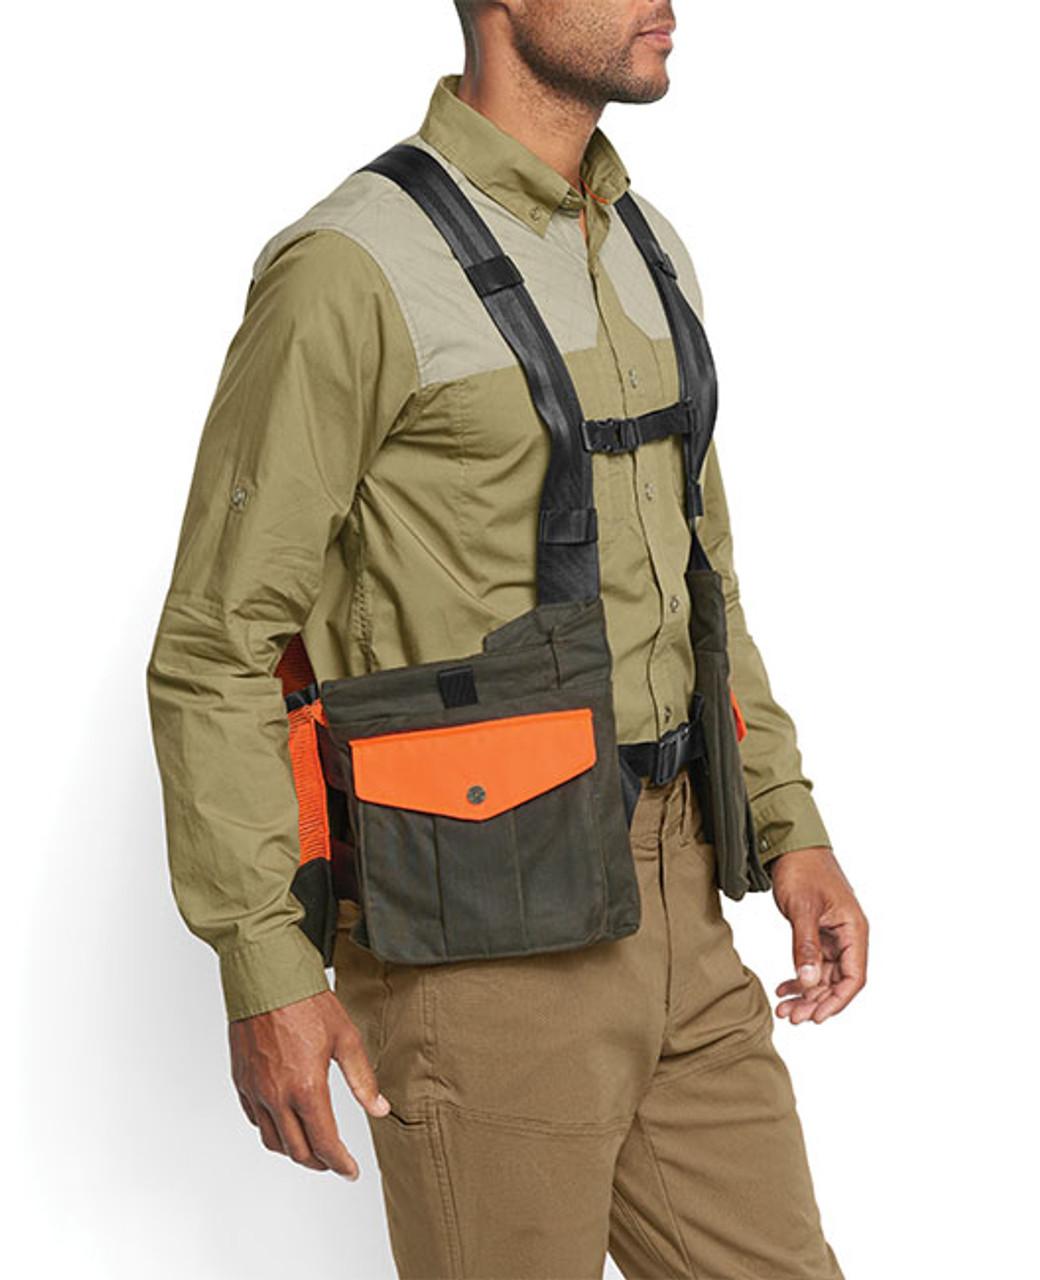 Orvis Waxed Cotton Strap Vest 6Y15